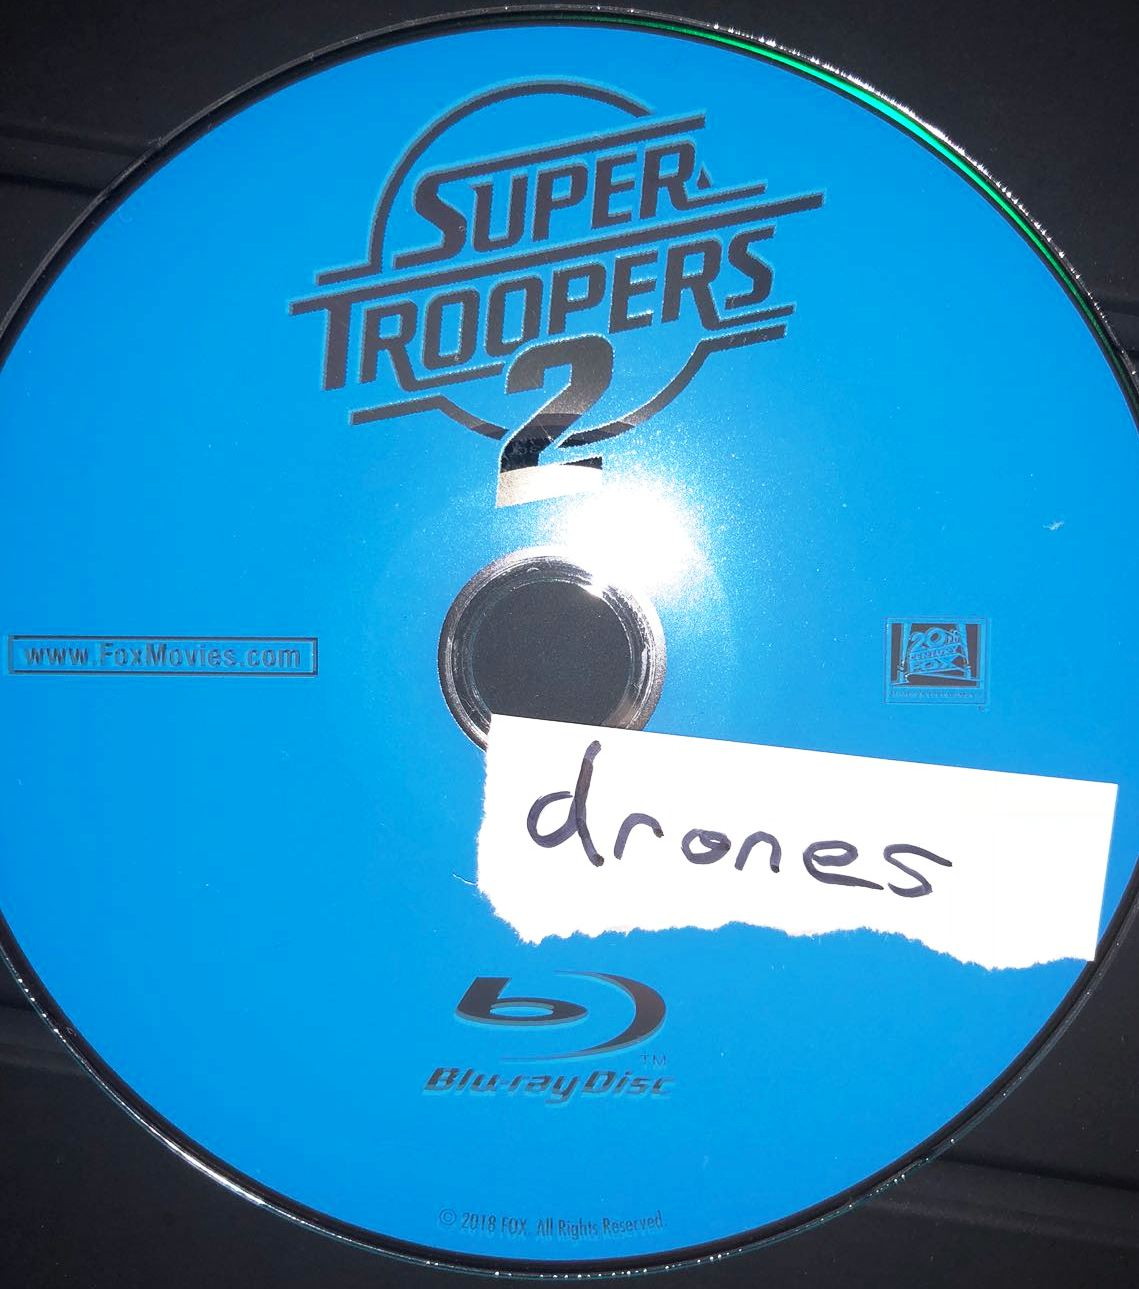 Super Troopers 2 2018 1080p BluRay x264-DRONES